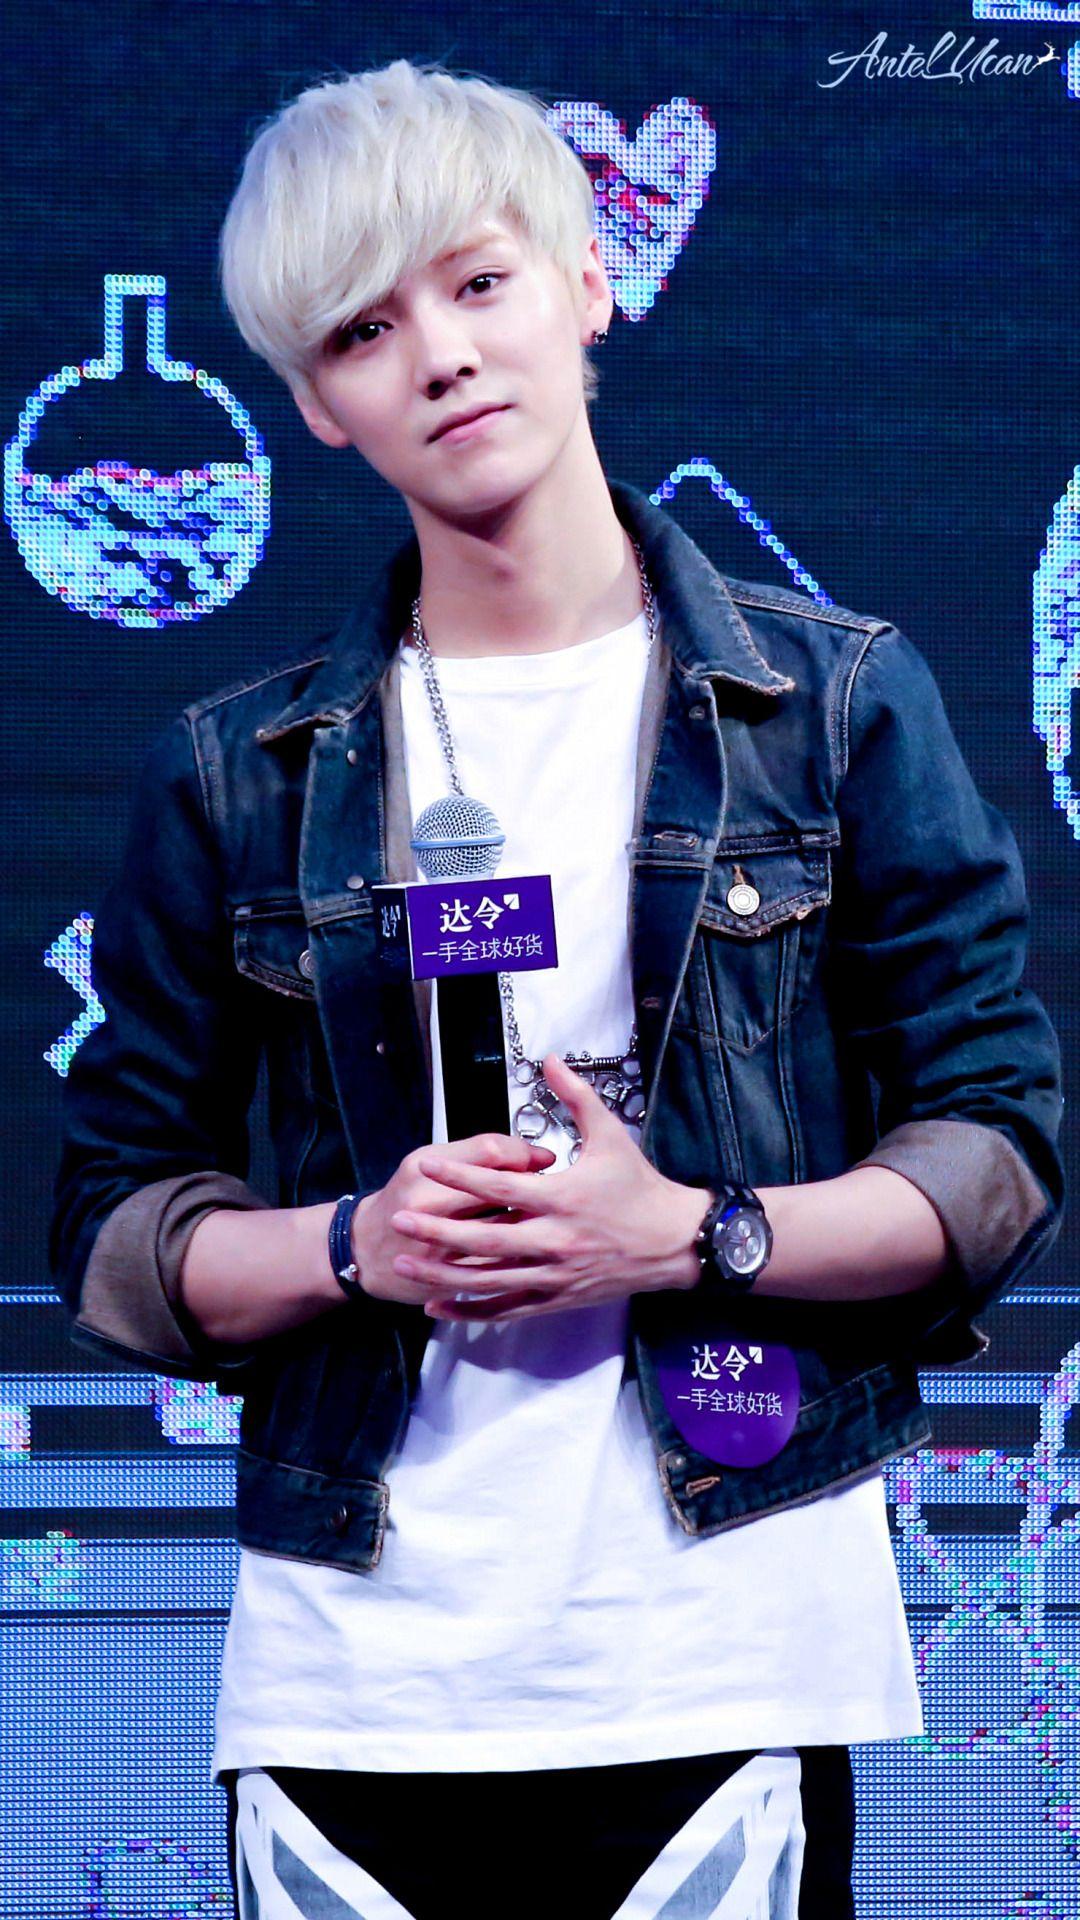 Luhan he looks like hes gonna cry